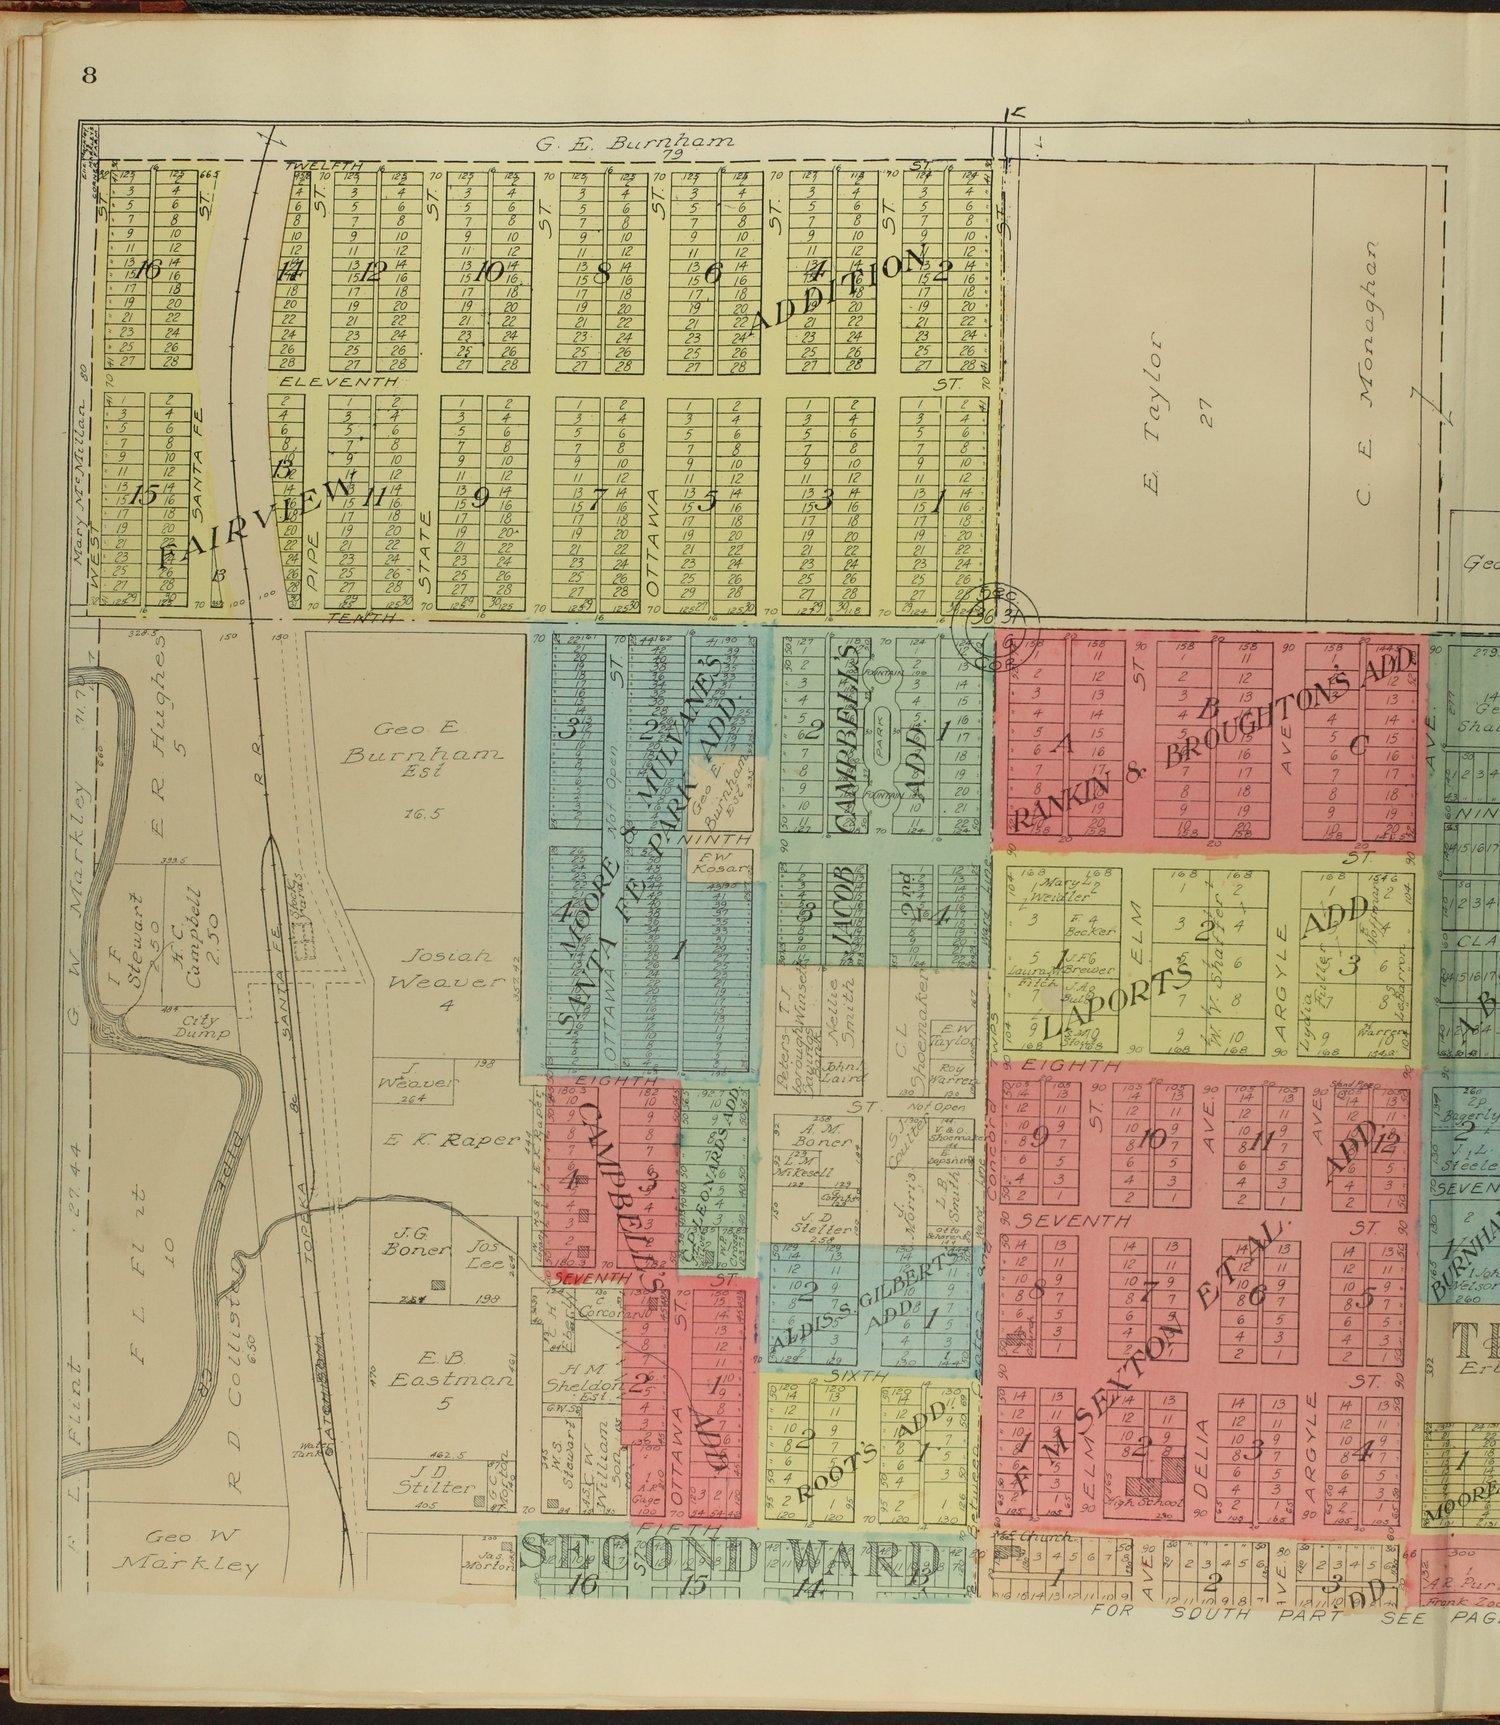 Standard atlas of Ottawa County, Kansas - 8